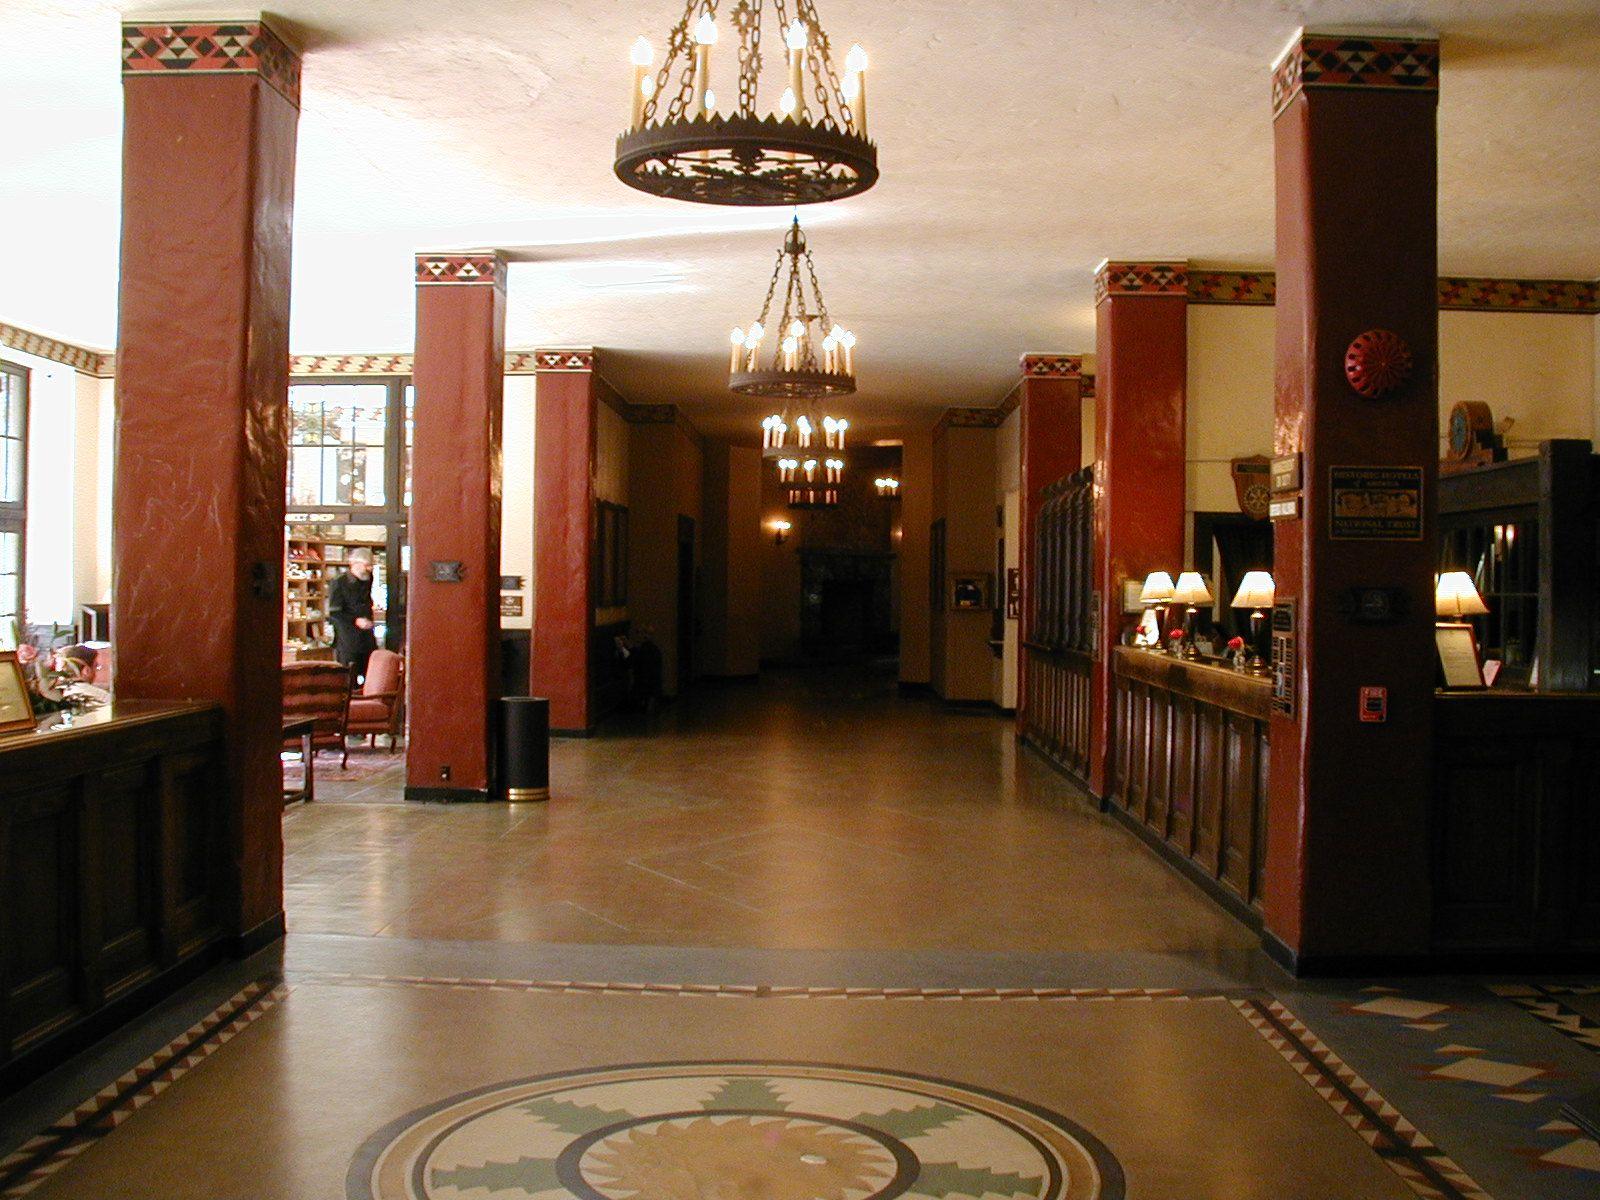 the shining hotel interior lobby - Google Search  Ahwahnee hotel, Hotel interior lobby, Ahwahnee